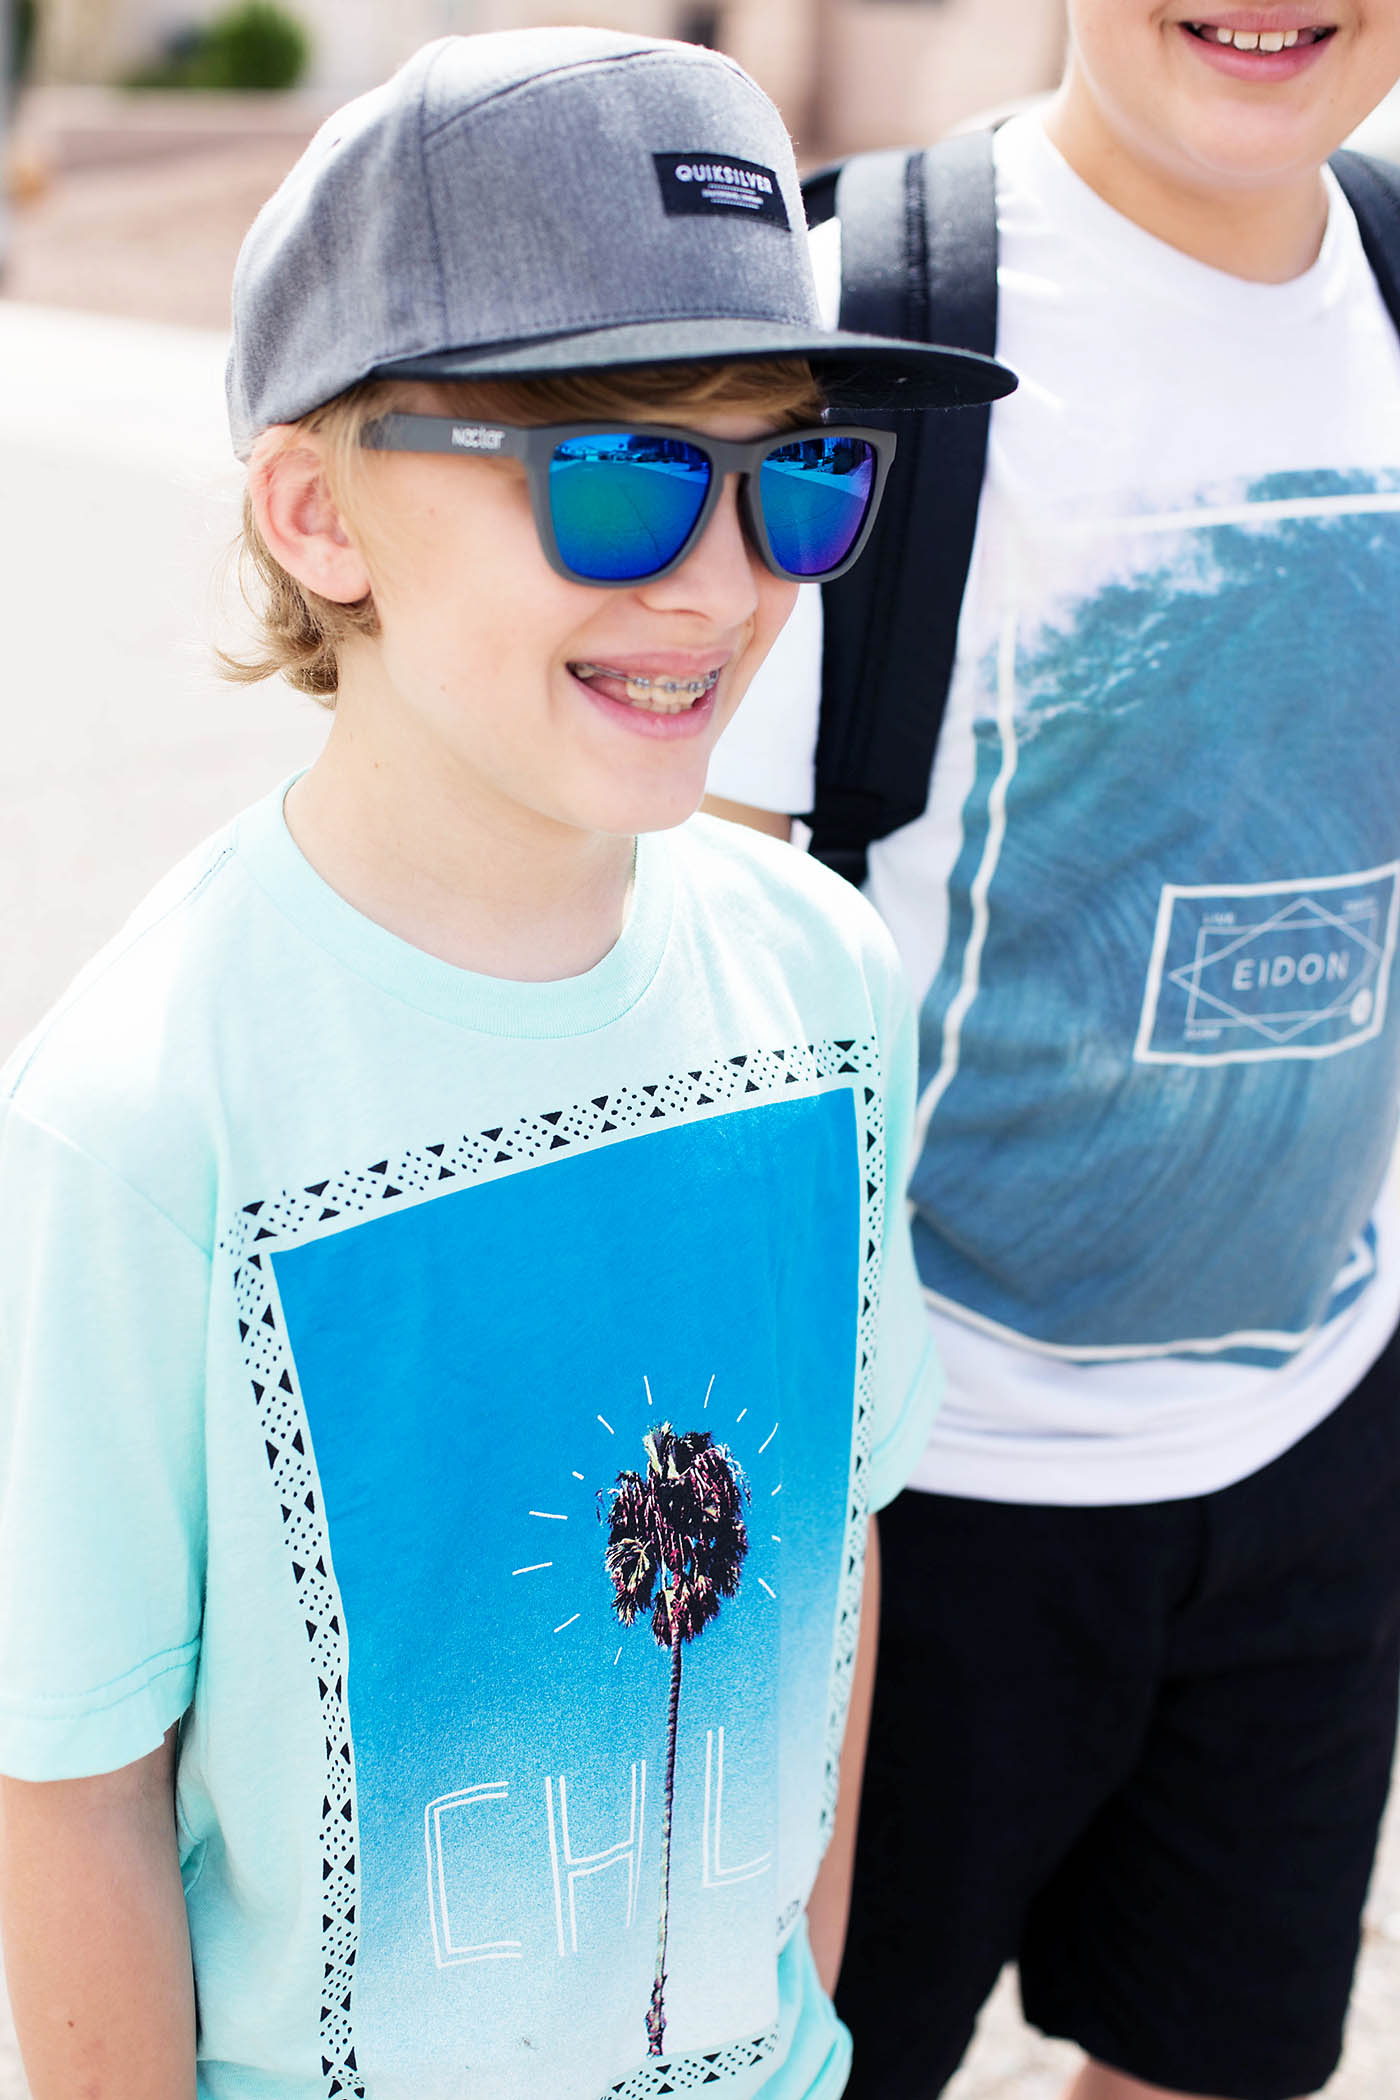 SwimOutlet.com - lots of surf brands for kids